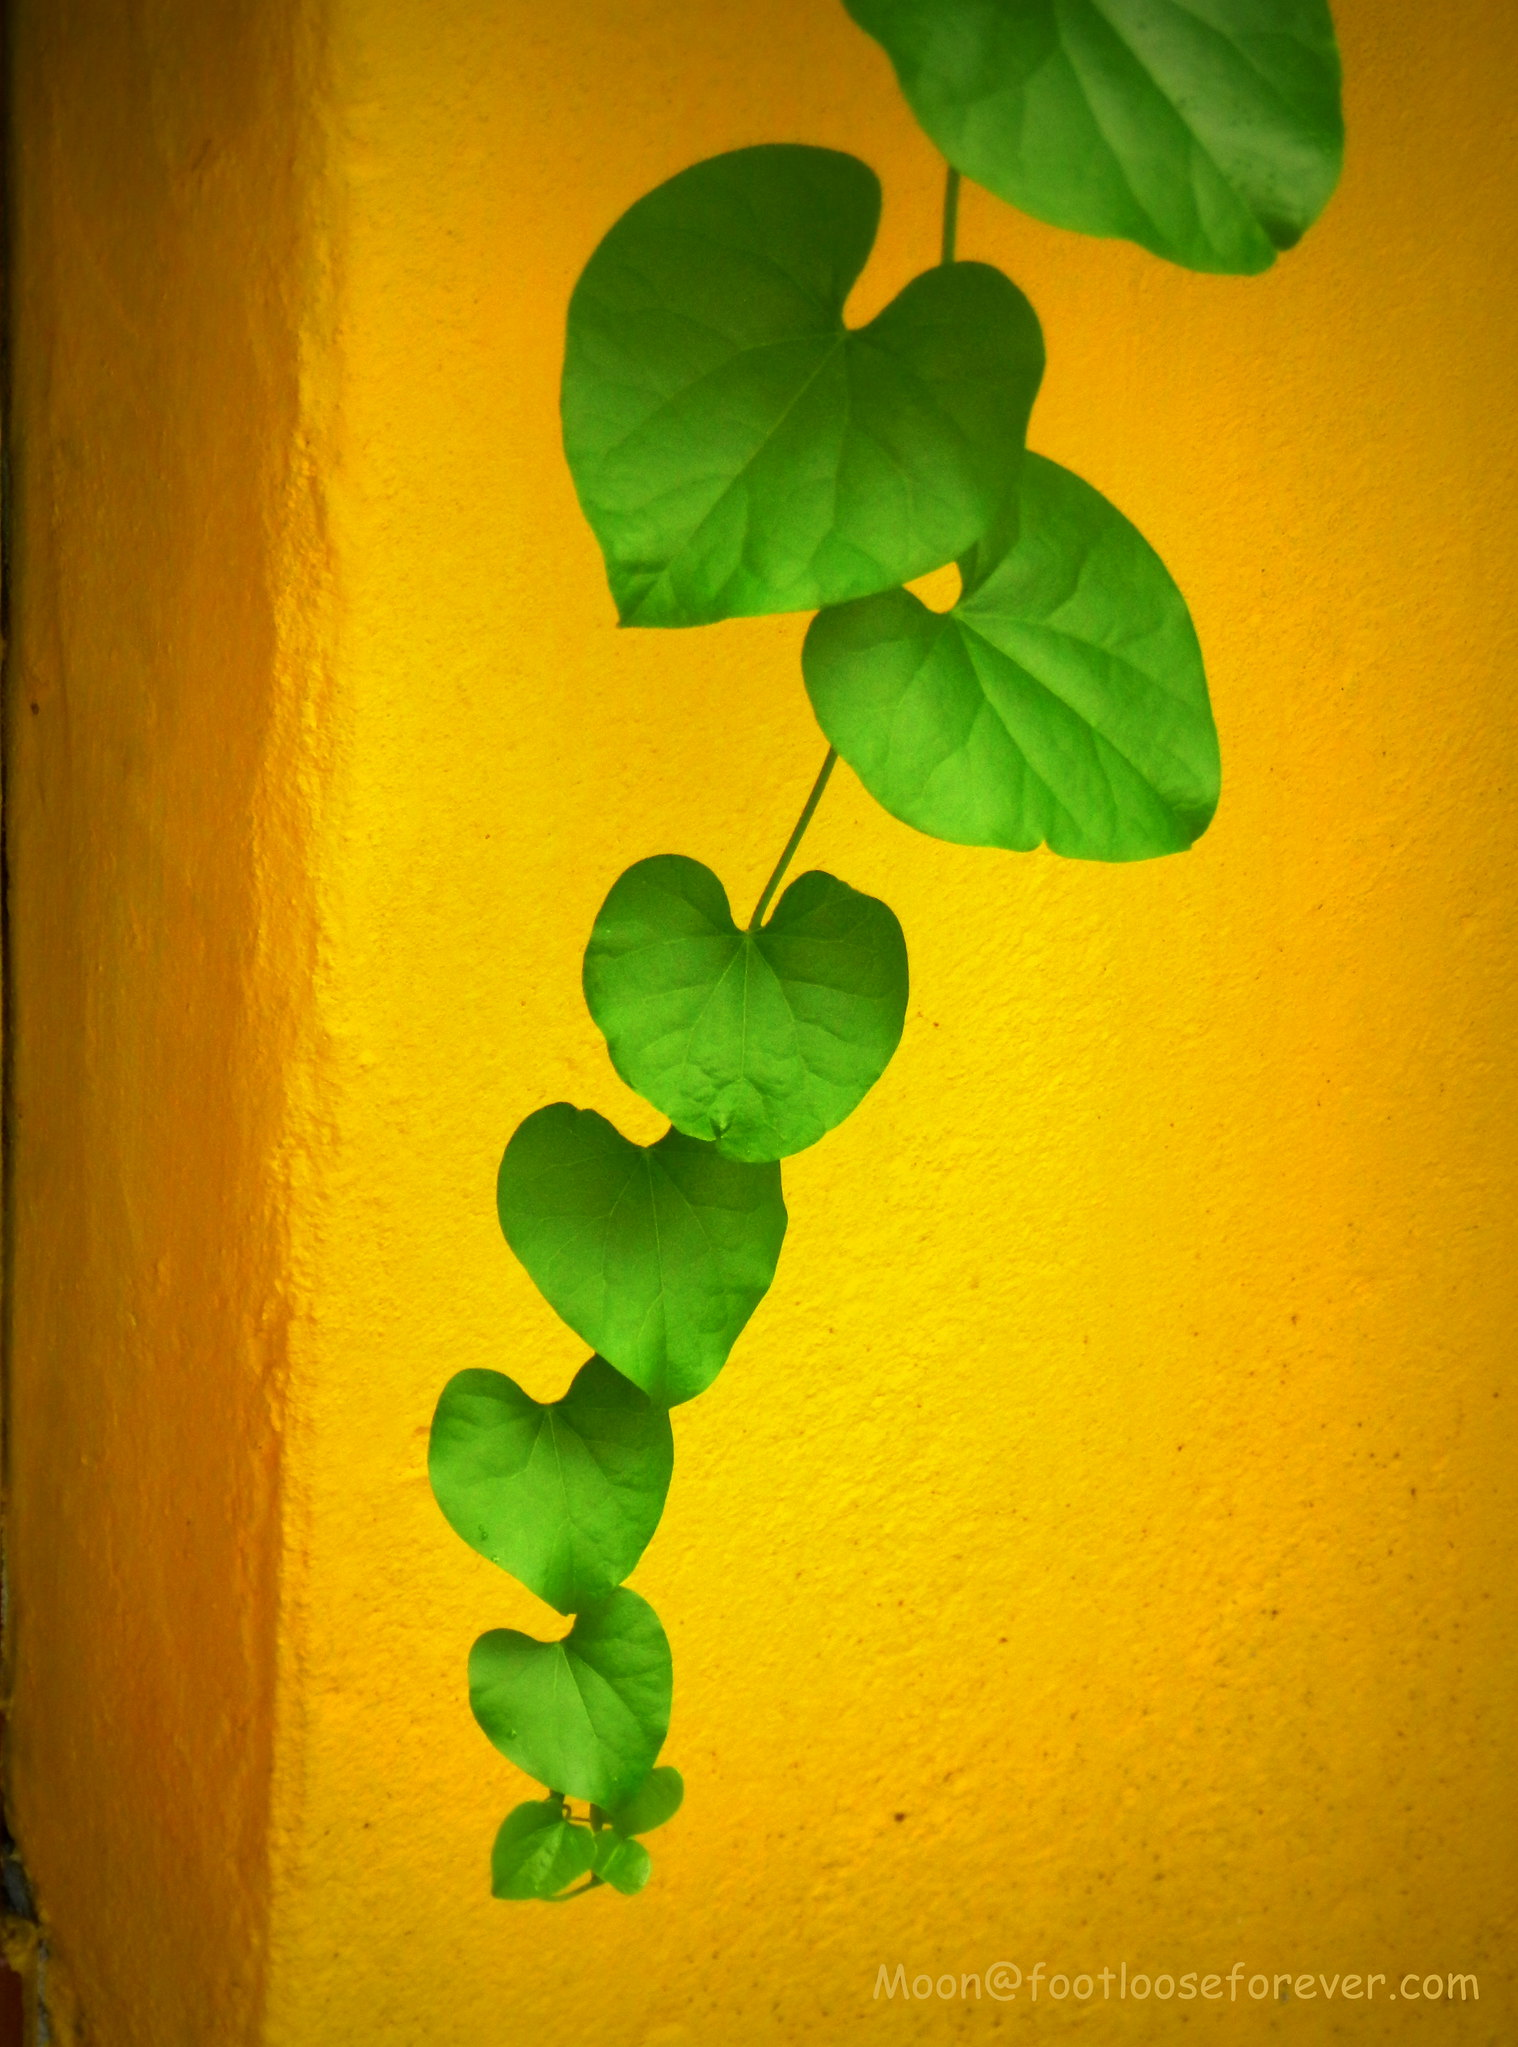 green leaves, green vine, yellow wall, minimalist photography